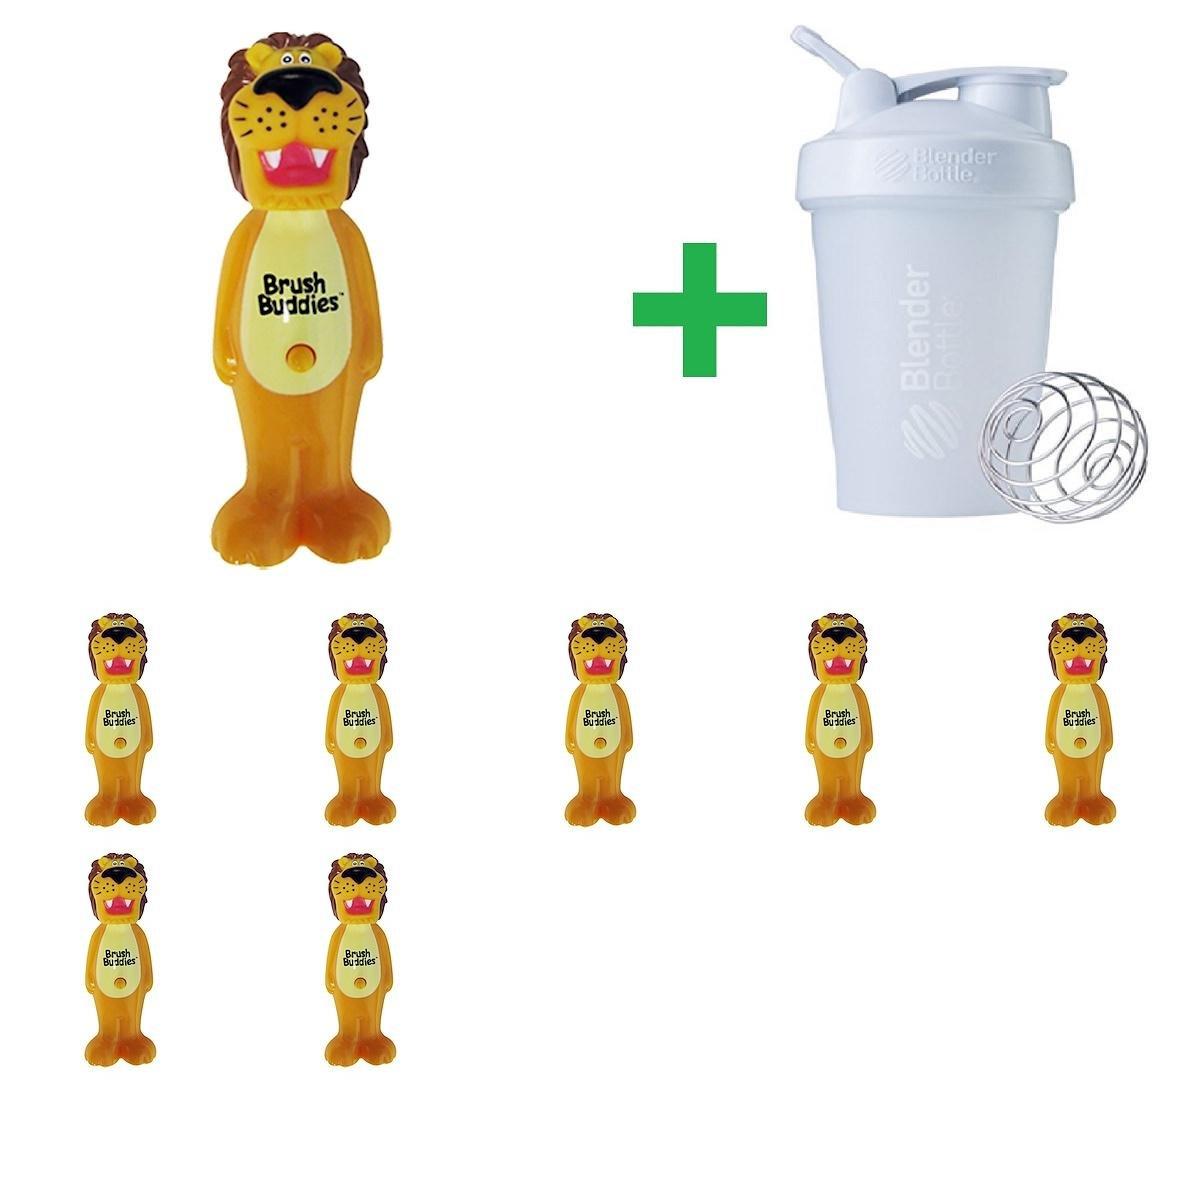 Brush Buddies, Poppin', Rickie Lion, Soft, 1 Toothbrush(8 Packs)+ Assorted Sundesa, BlenderBottle, Classic With Loop, 20 oz by Brush BuddiesToothbrush